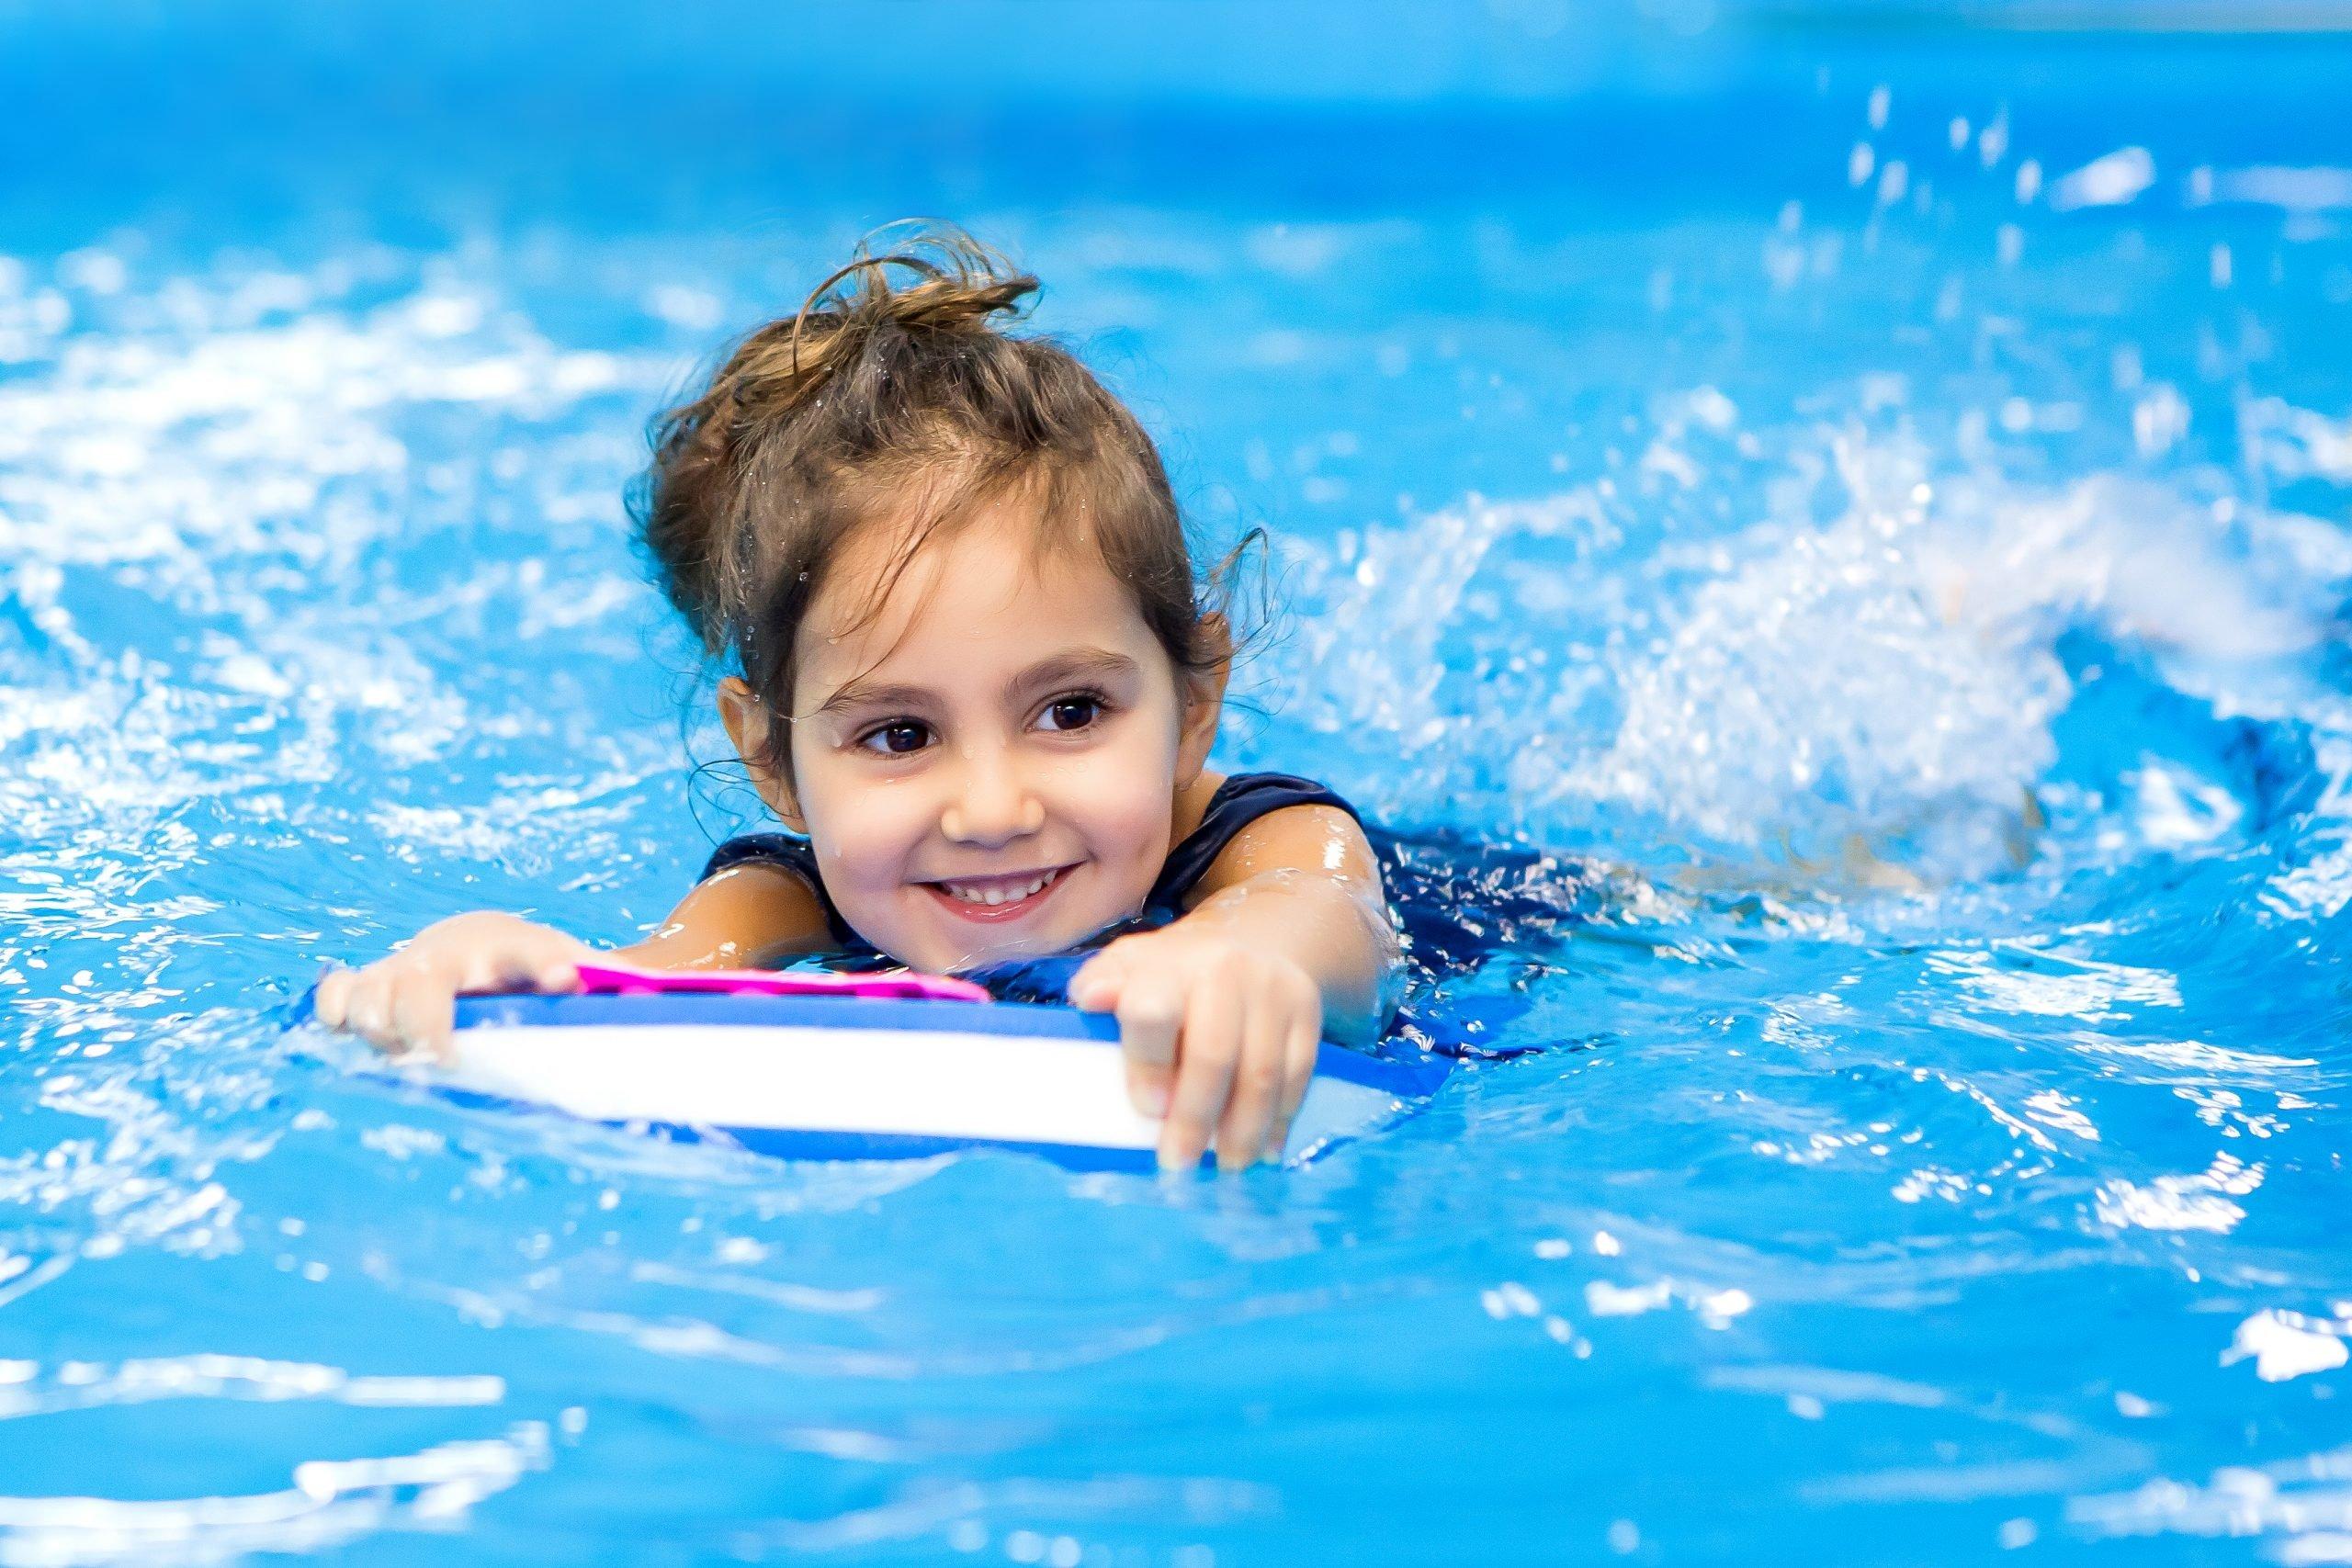 Sport-Bambina a Nuota